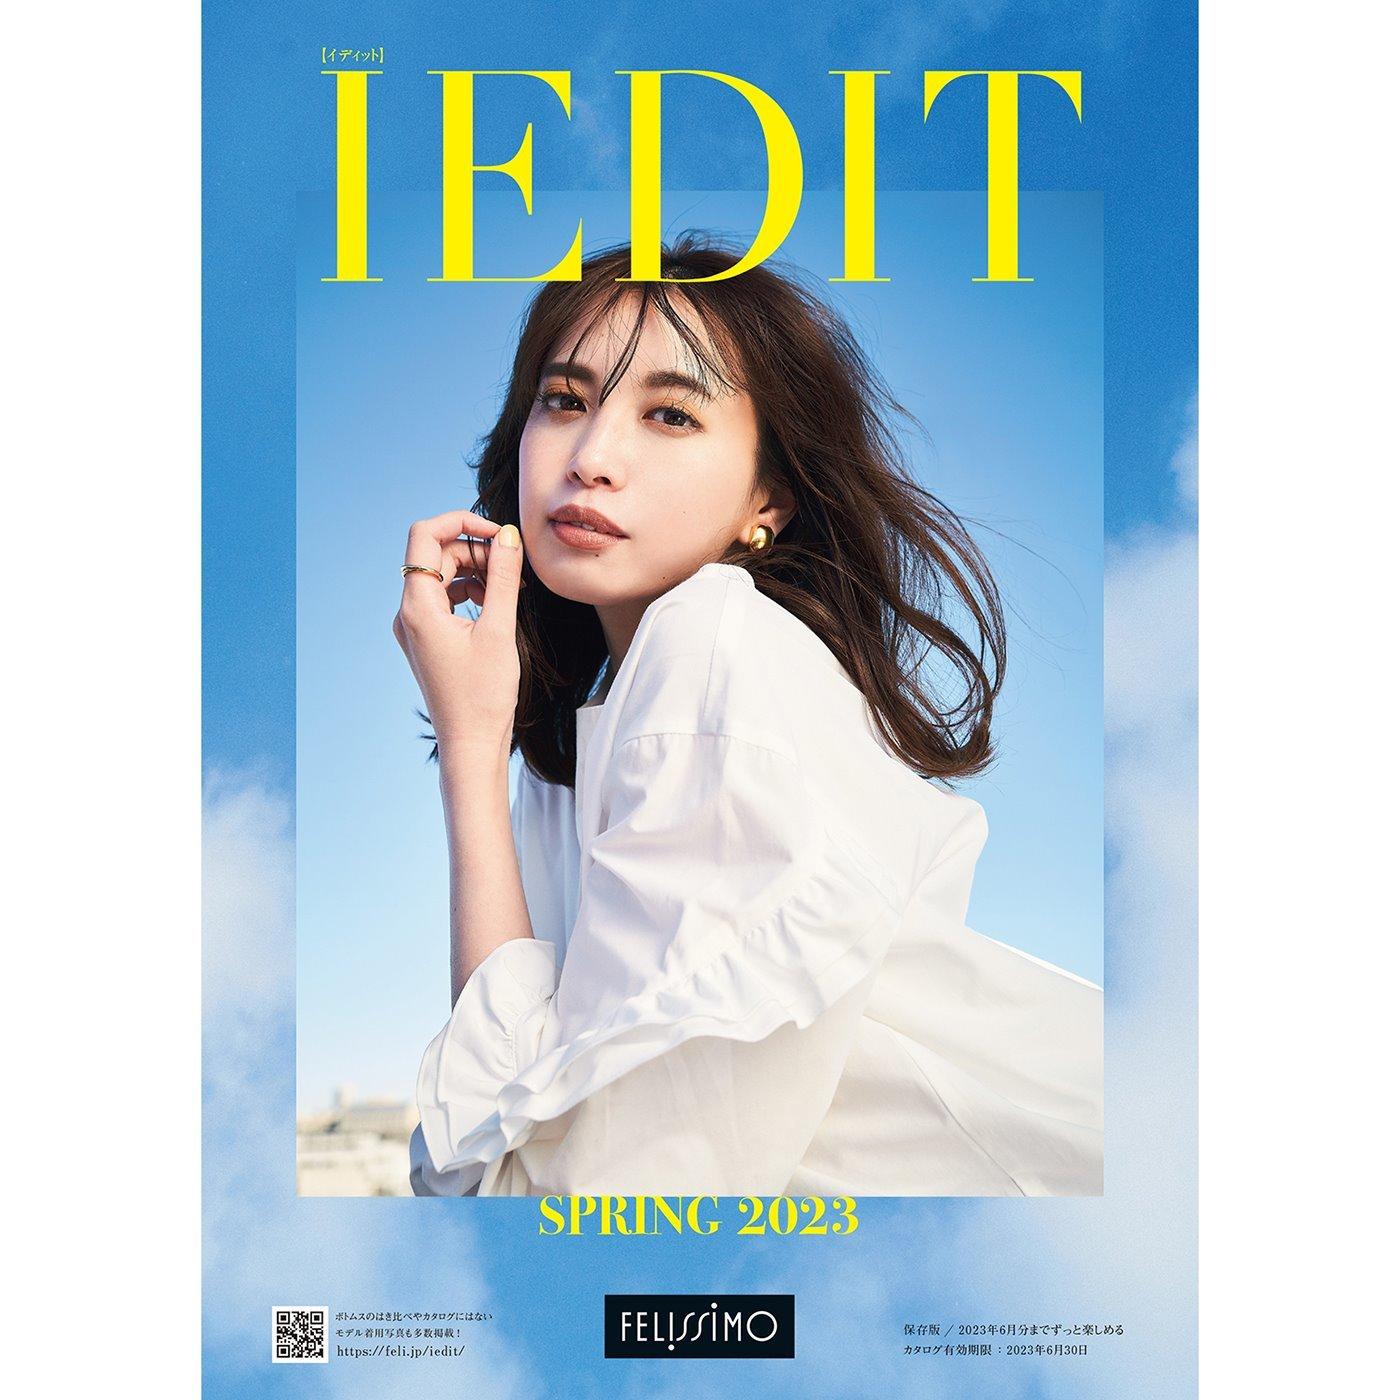 『IEDIT[イディット]』 カタログ予約